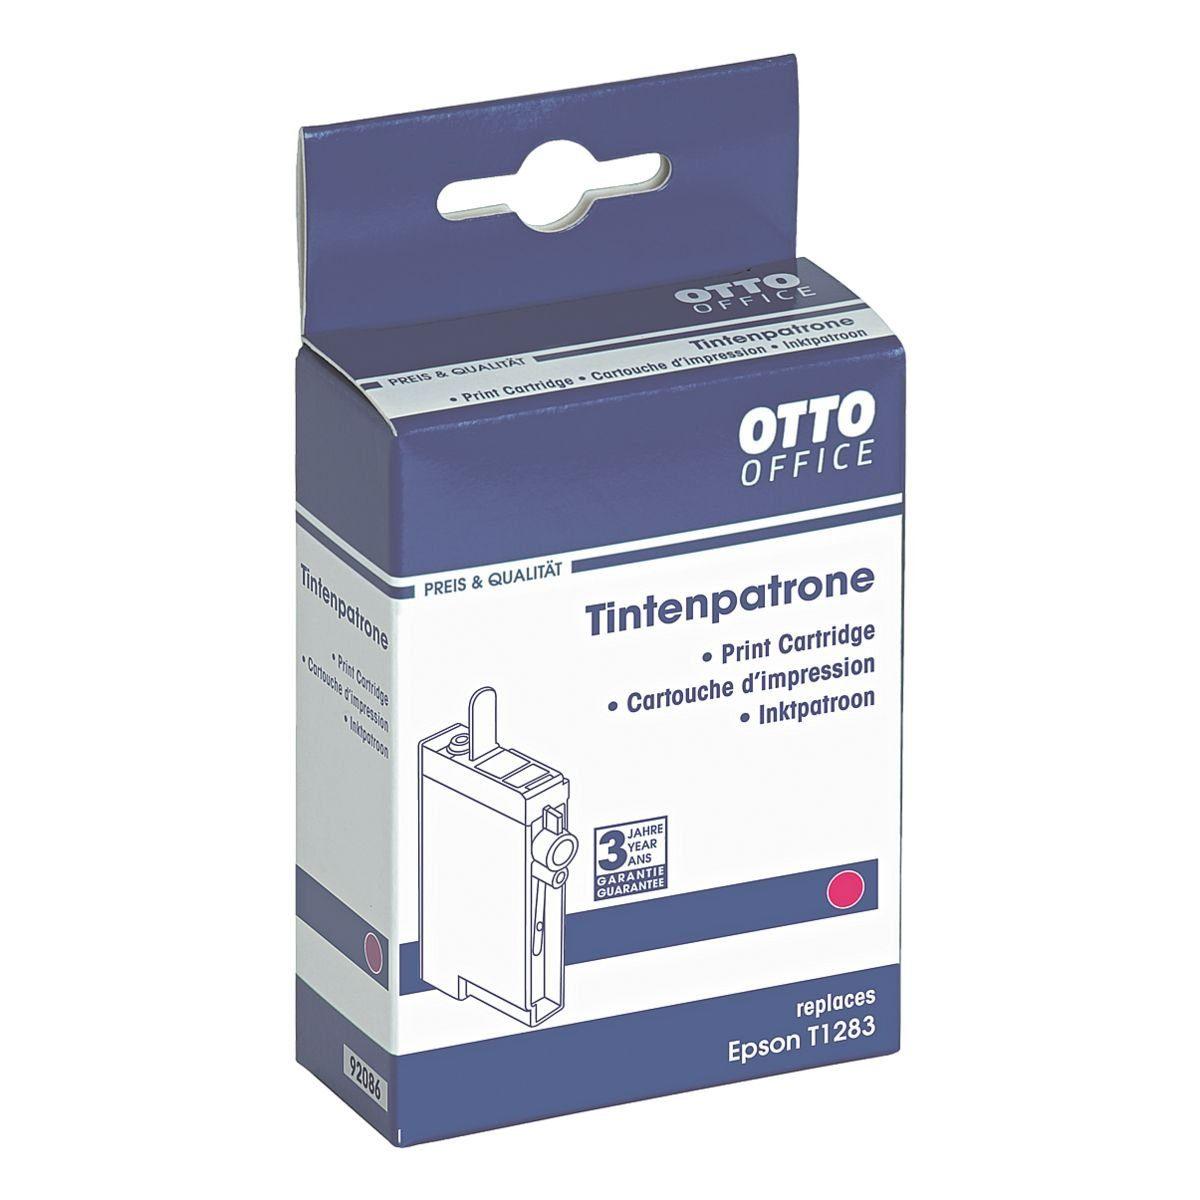 OTTO Office Tintenpatrone ersetzt Epson »T1283«